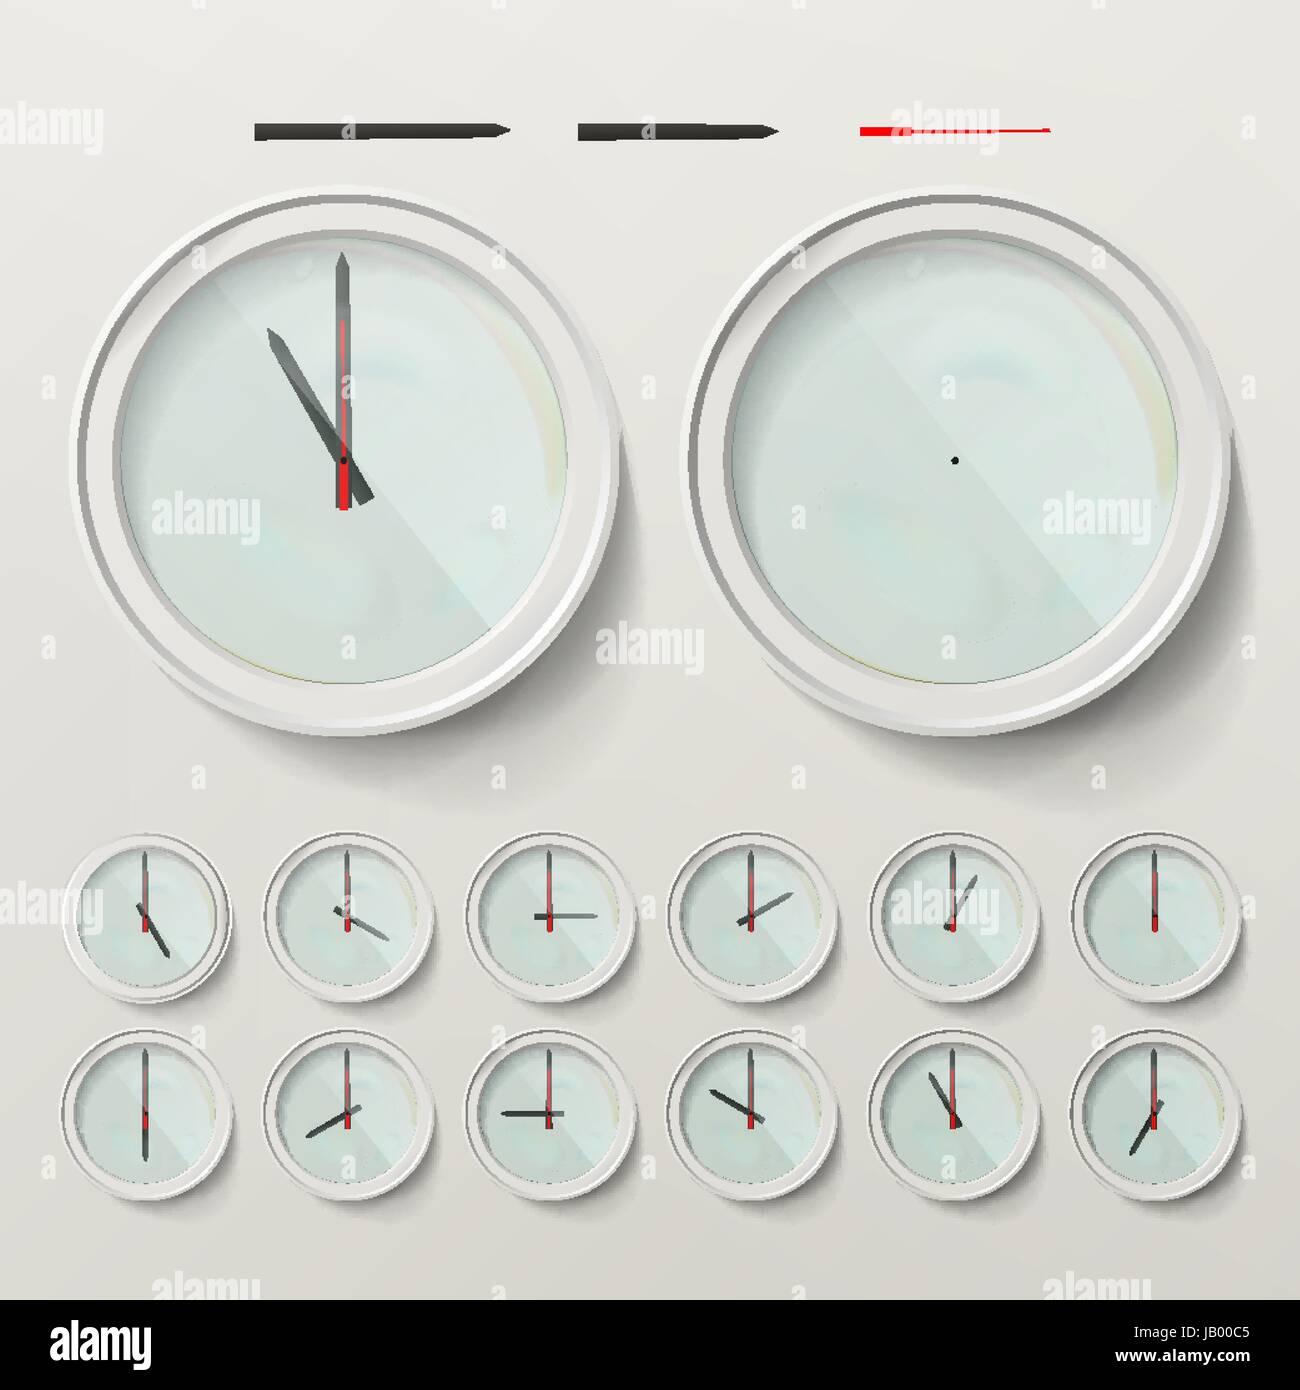 Realistic Wall Clocks Set Vector Illustration. Wall Analog Clock. - Stock Image